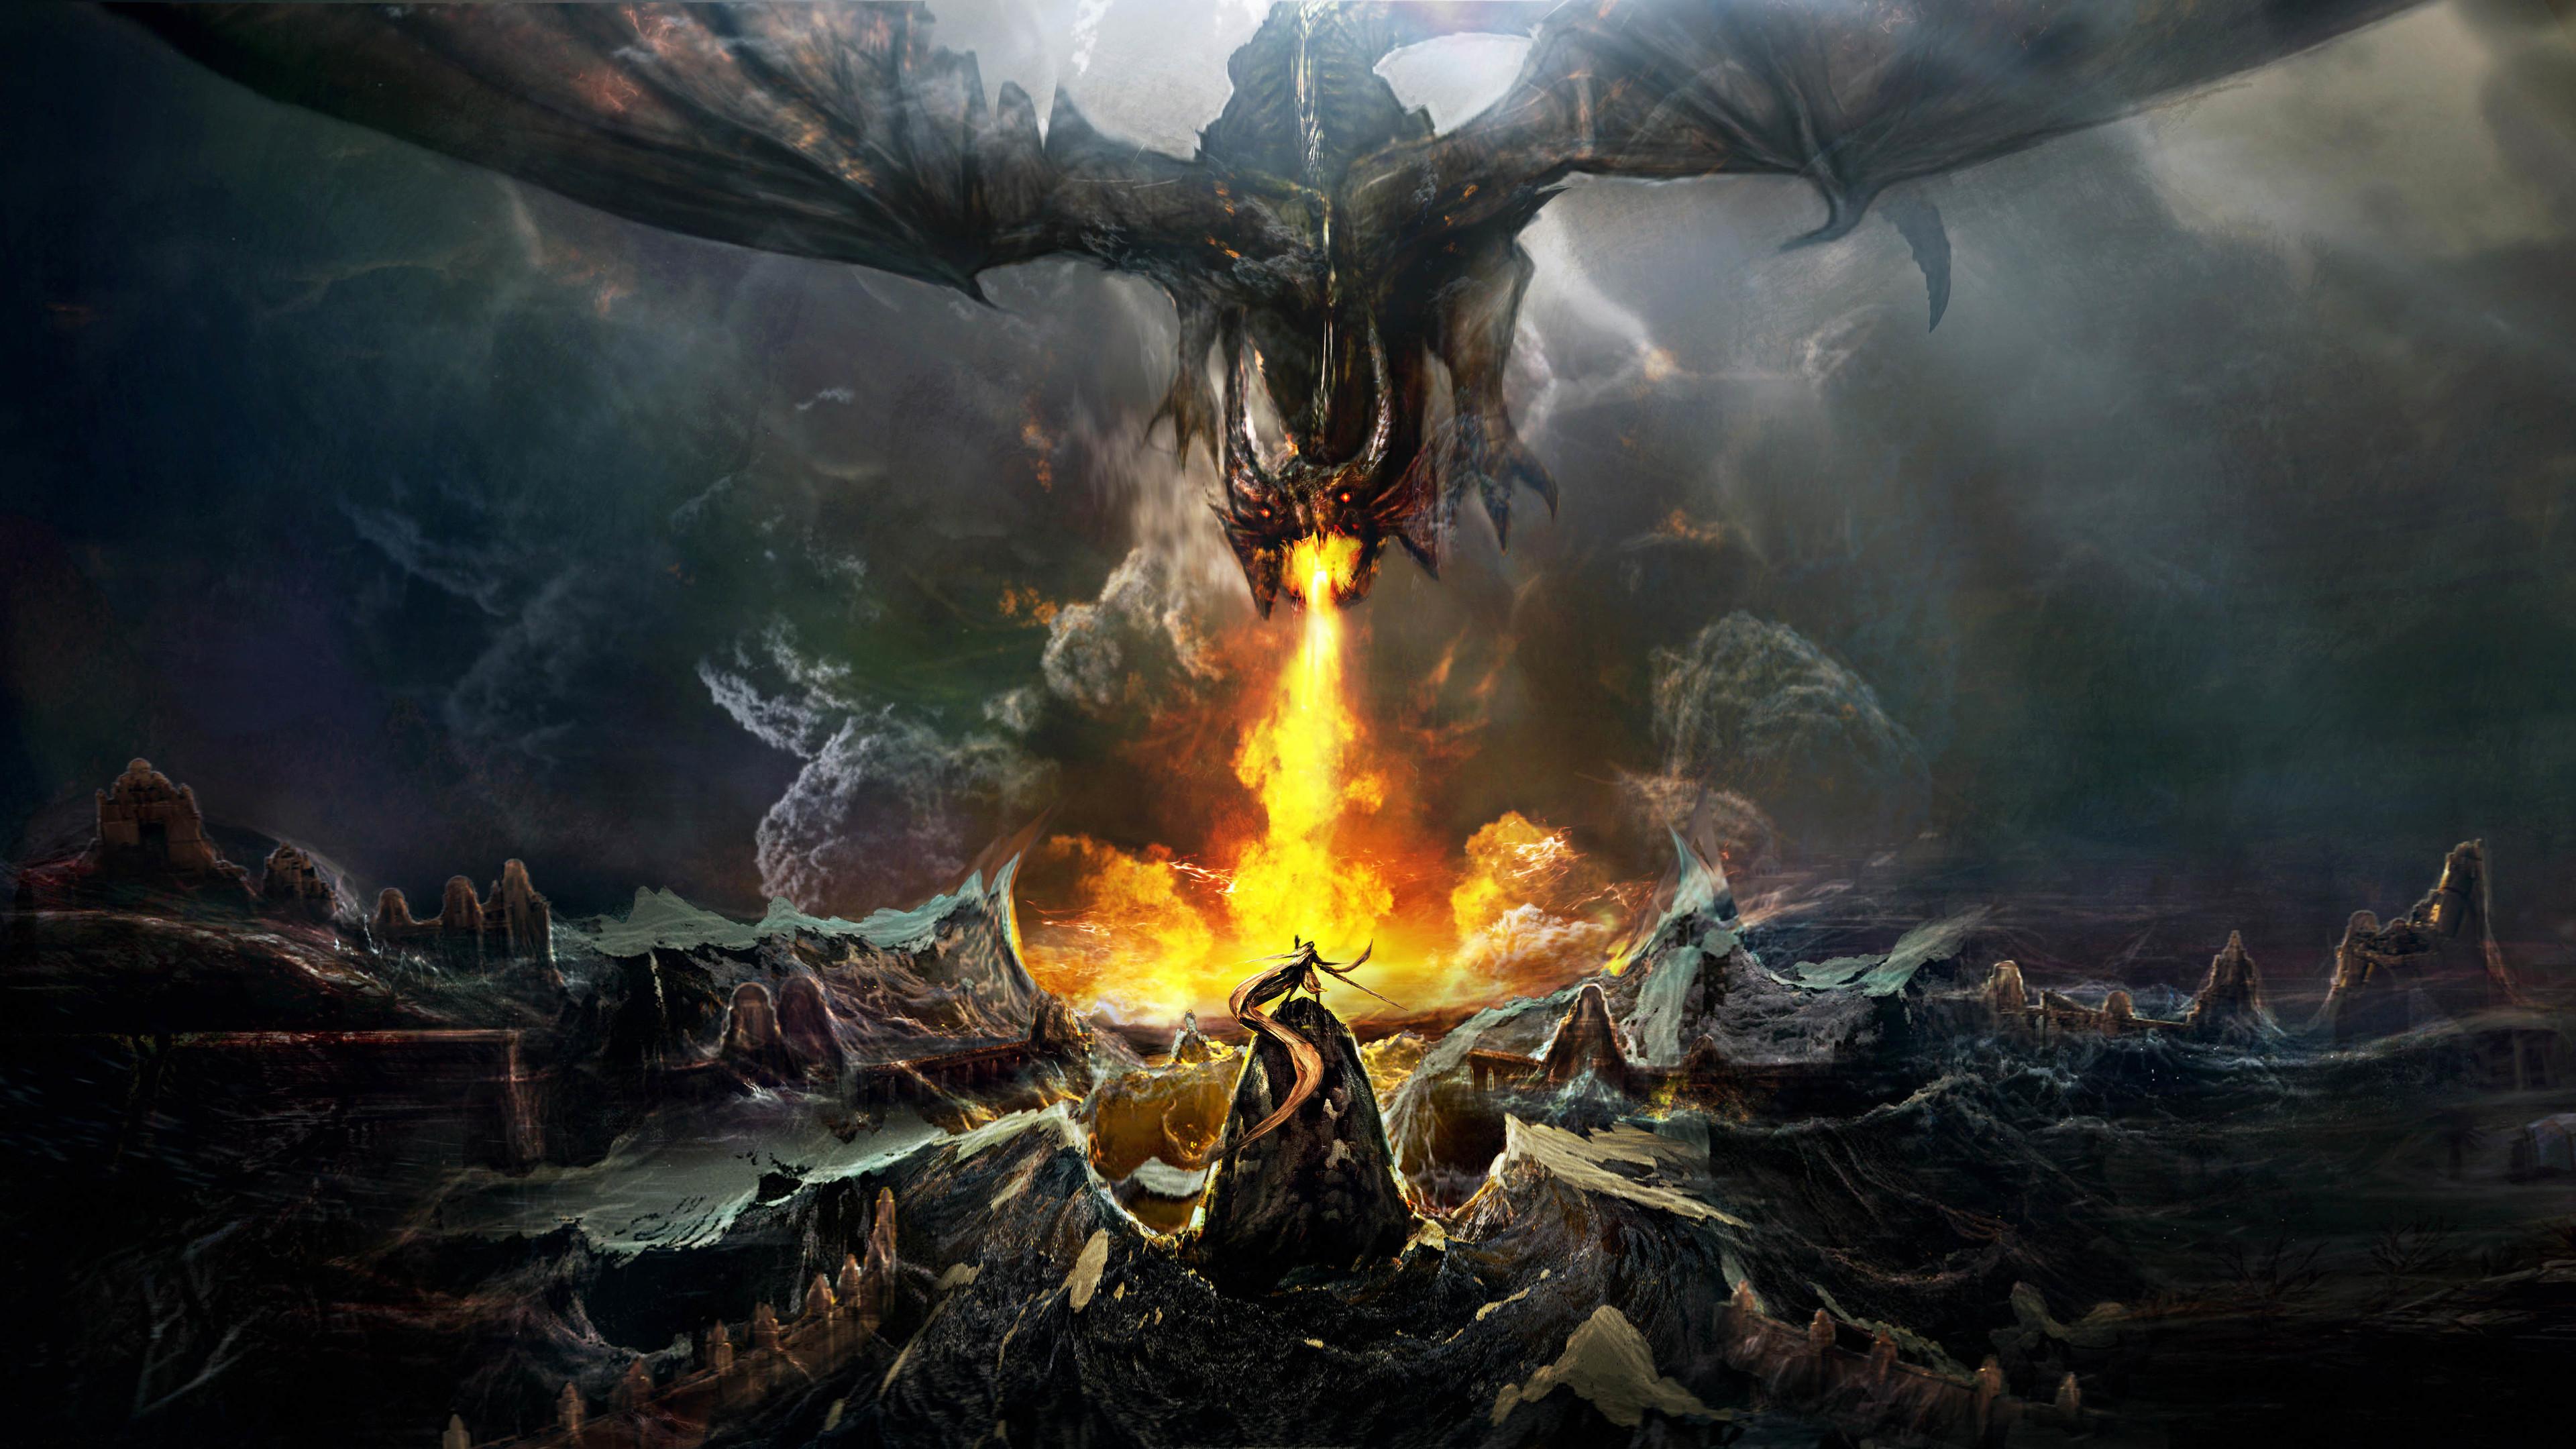 dragon throwing fire on warrior 4k 1540751500 - Dragon Throwing Fire On Warrior 4k - warrior wallpapers, hd-wallpapers, fire wallpapers, dragon wallpapers, digital art wallpapers, deviantart wallpapers, artist wallpapers, 5k wallpapers, 4k-wallpapers